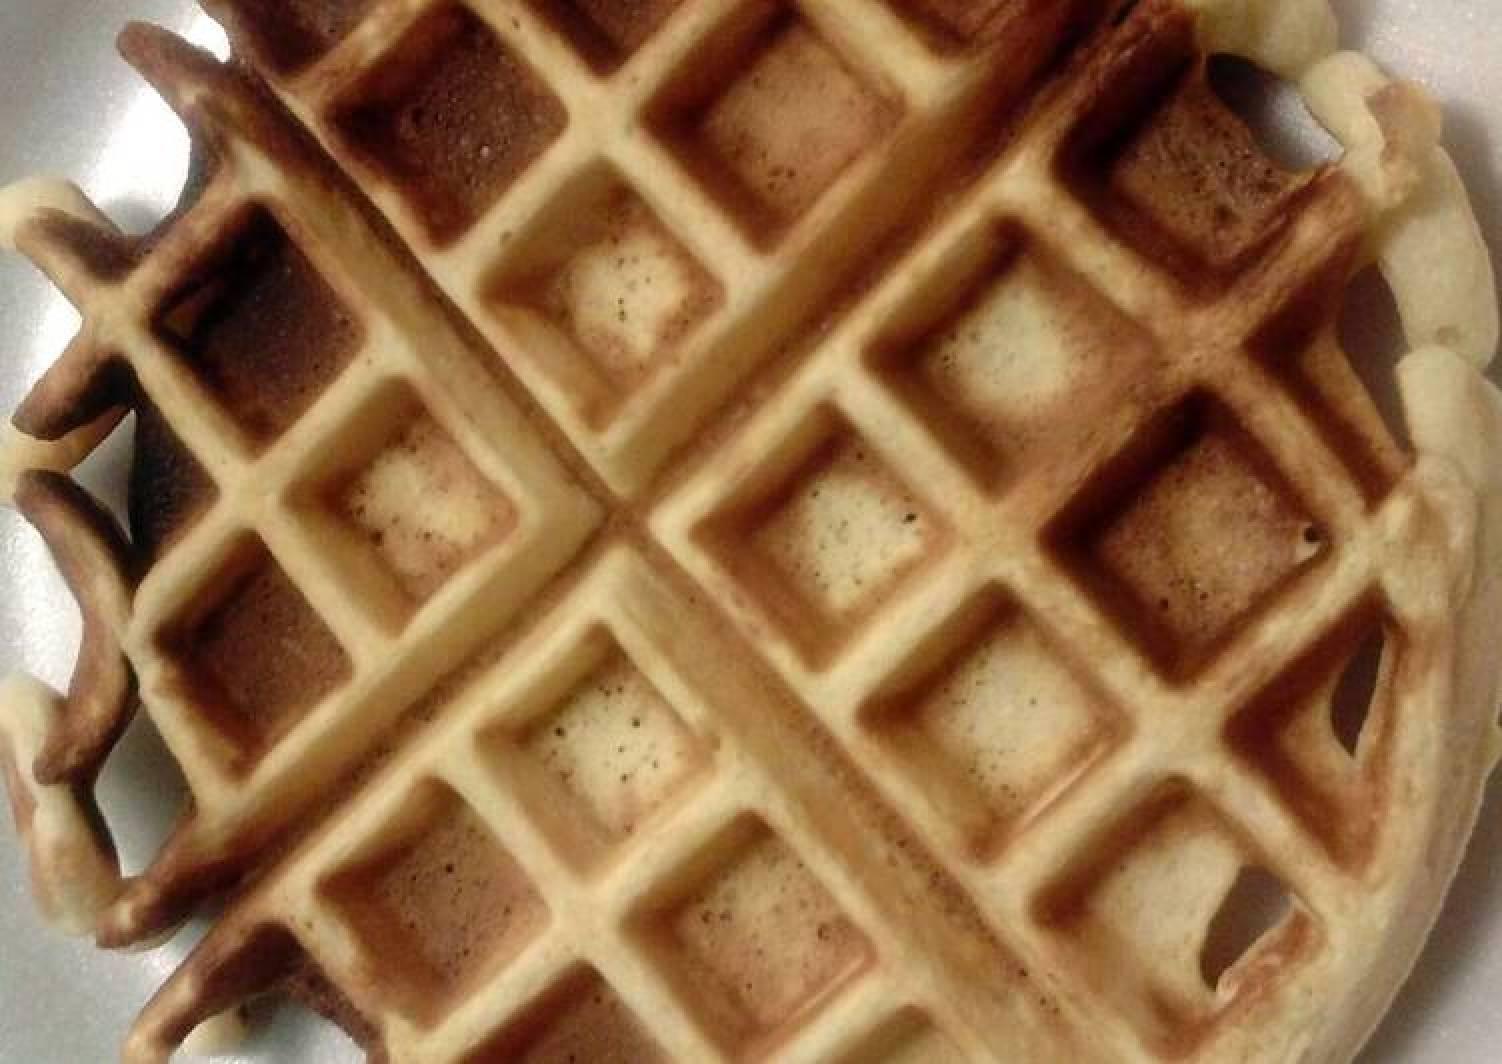 Best-Ever Belgian Waffle